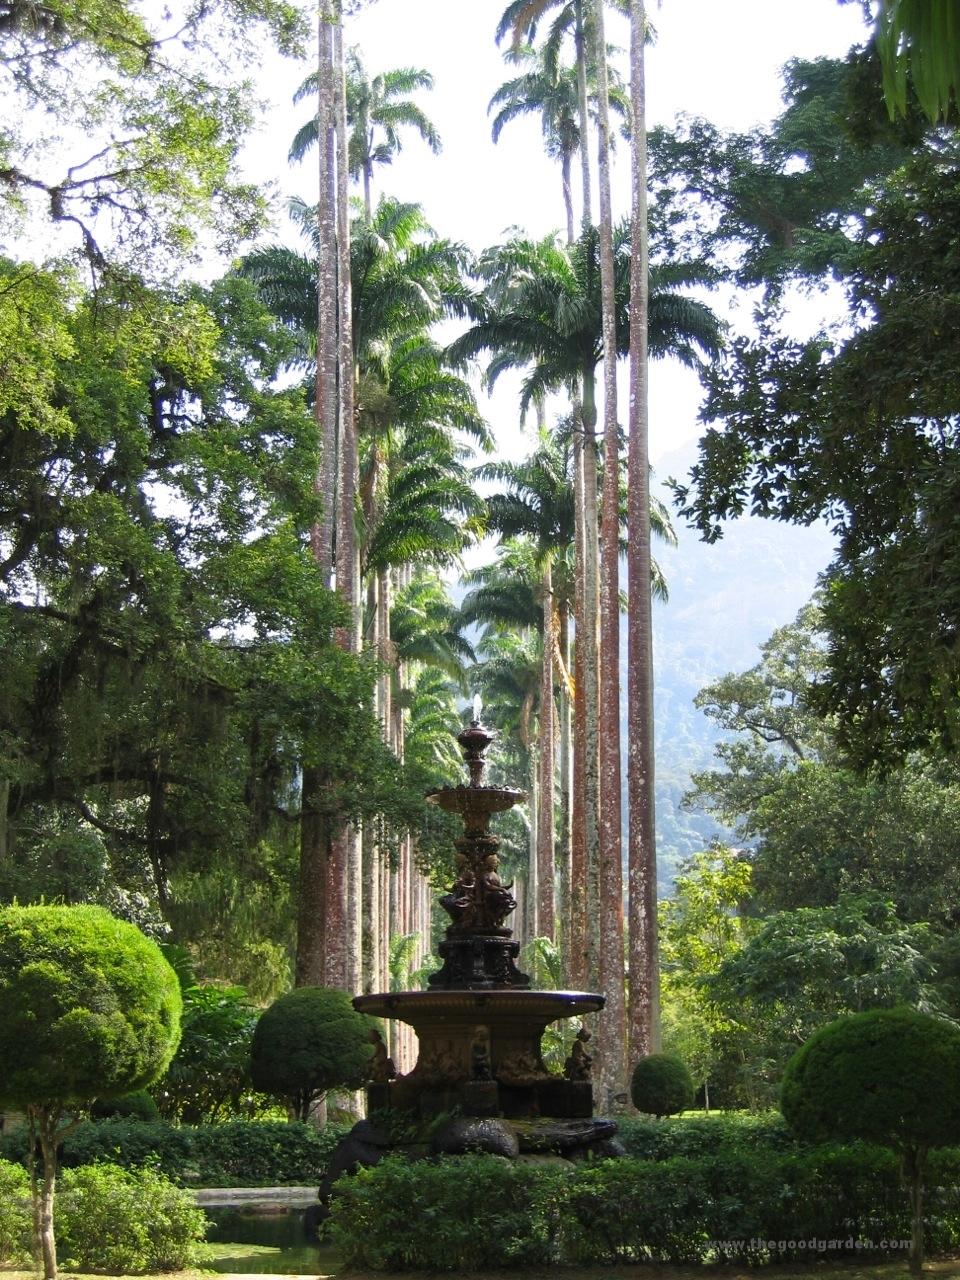 thegoodgarden|brazil|riodejaneiro|garden|932.jpg